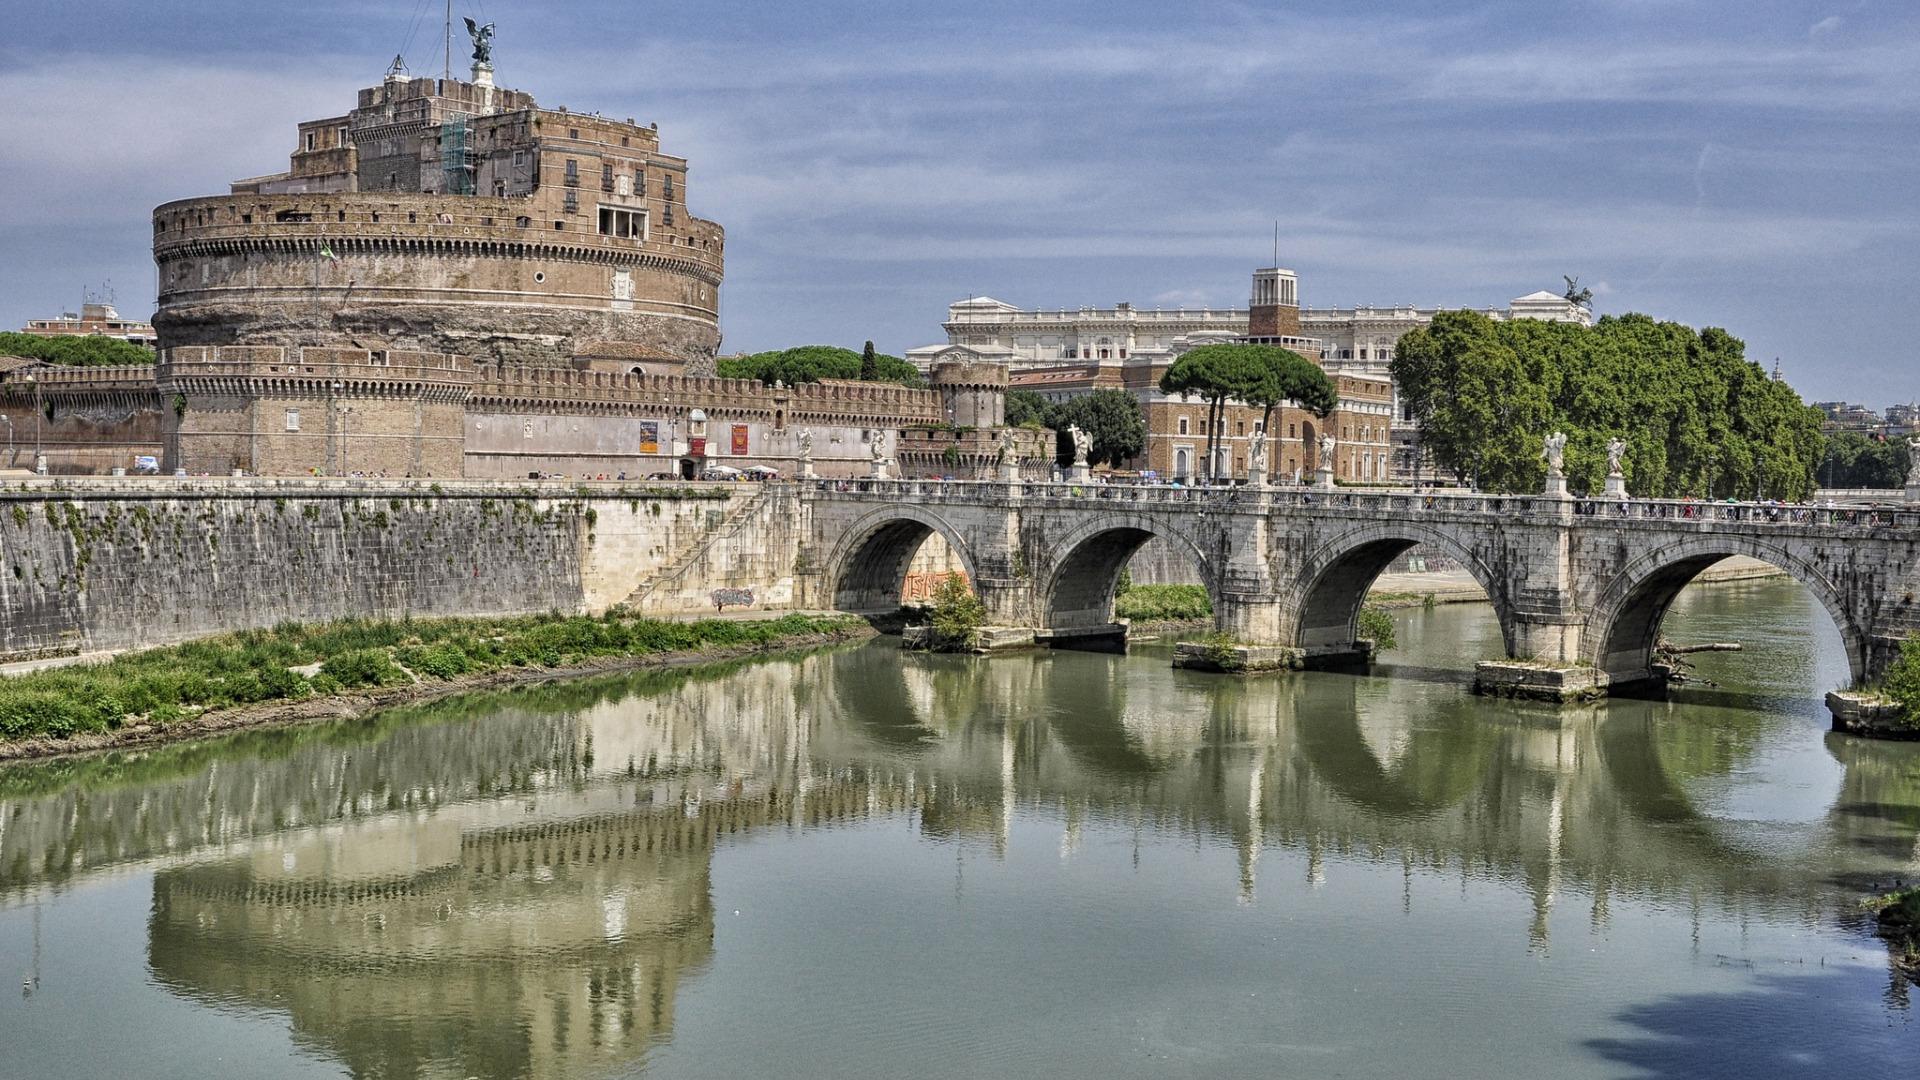 The Vatican Seen Past the Tiber River, Rome, Italy  № 1467622 бесплатно